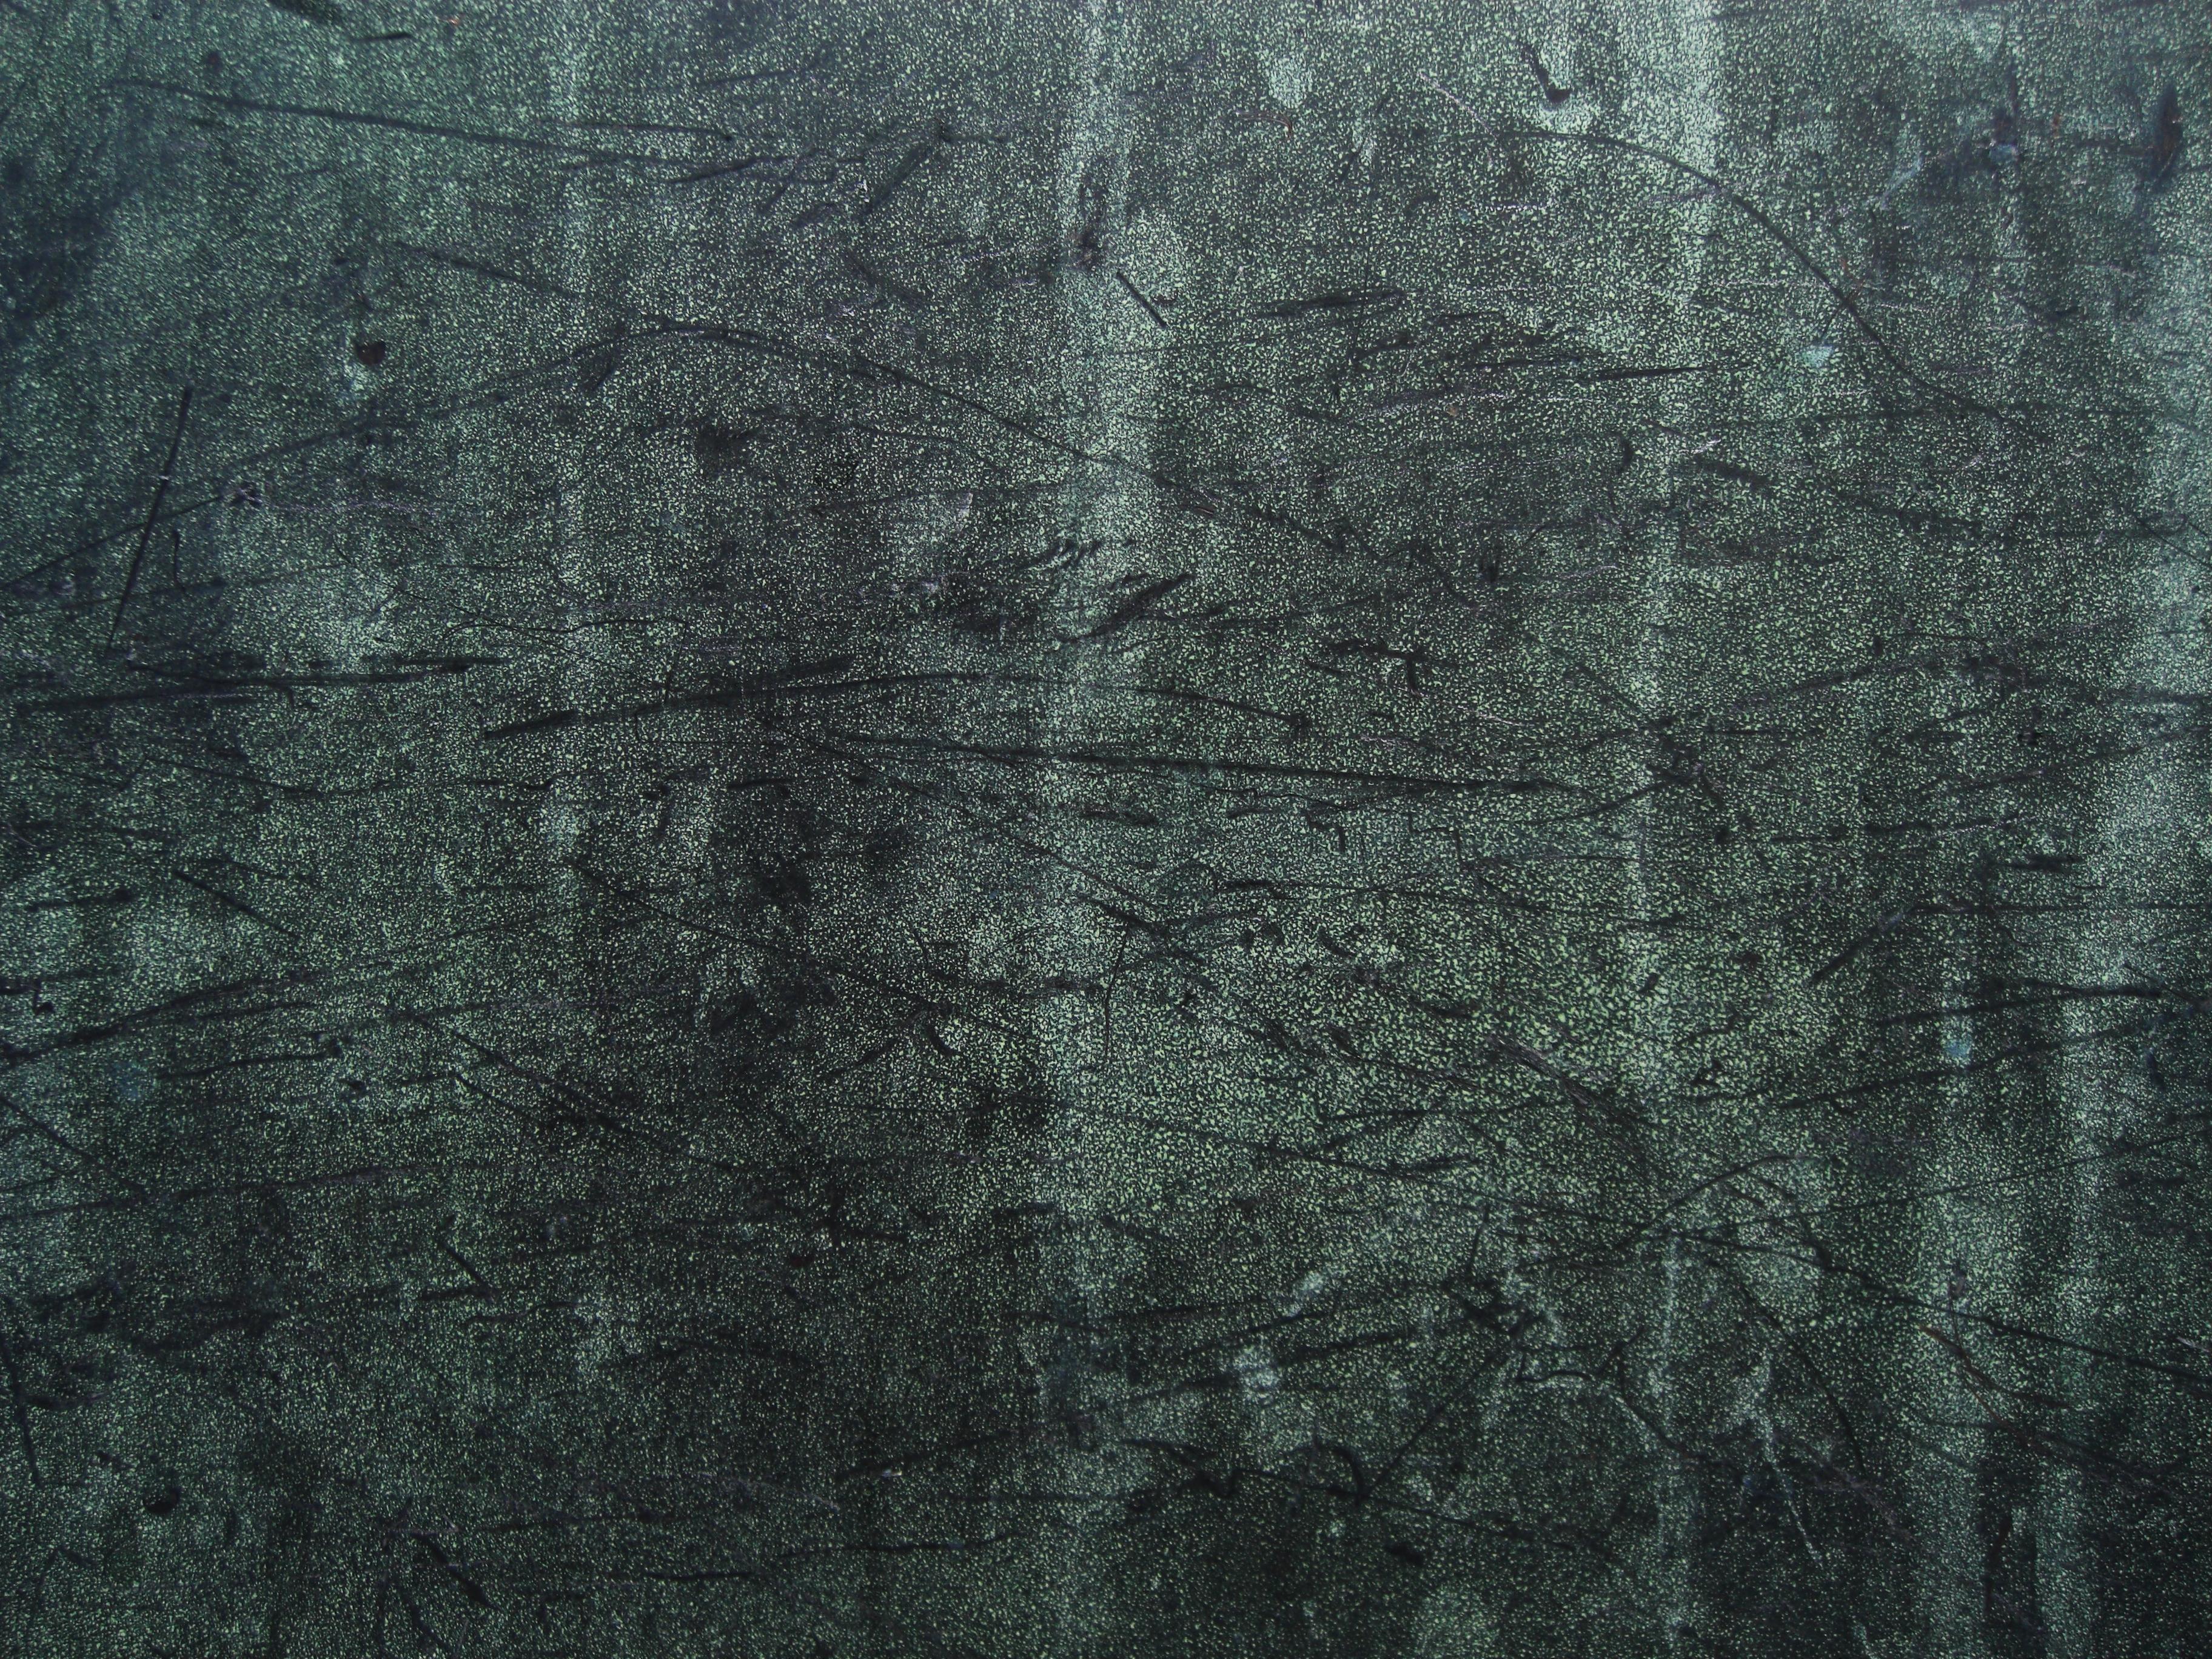 black background grunge metal noise texture 3648x2736